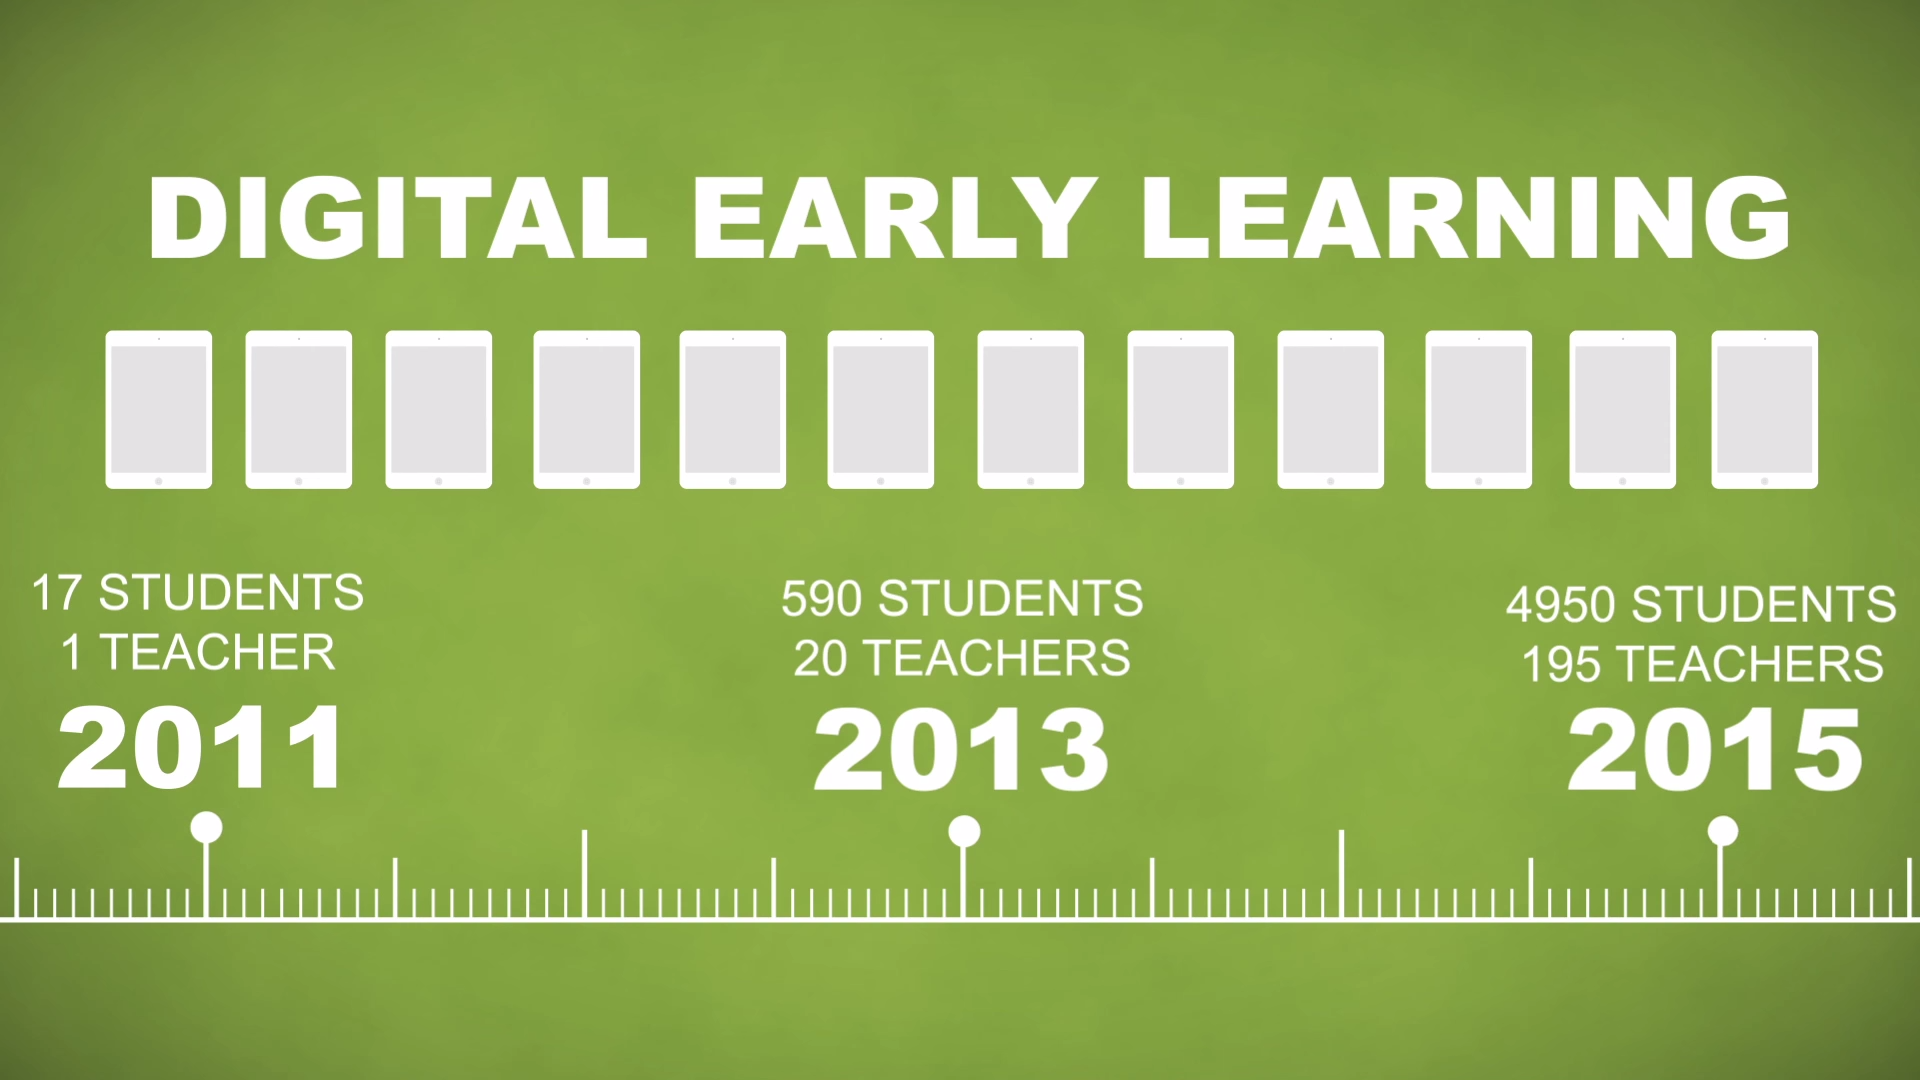 Digital Early Learning